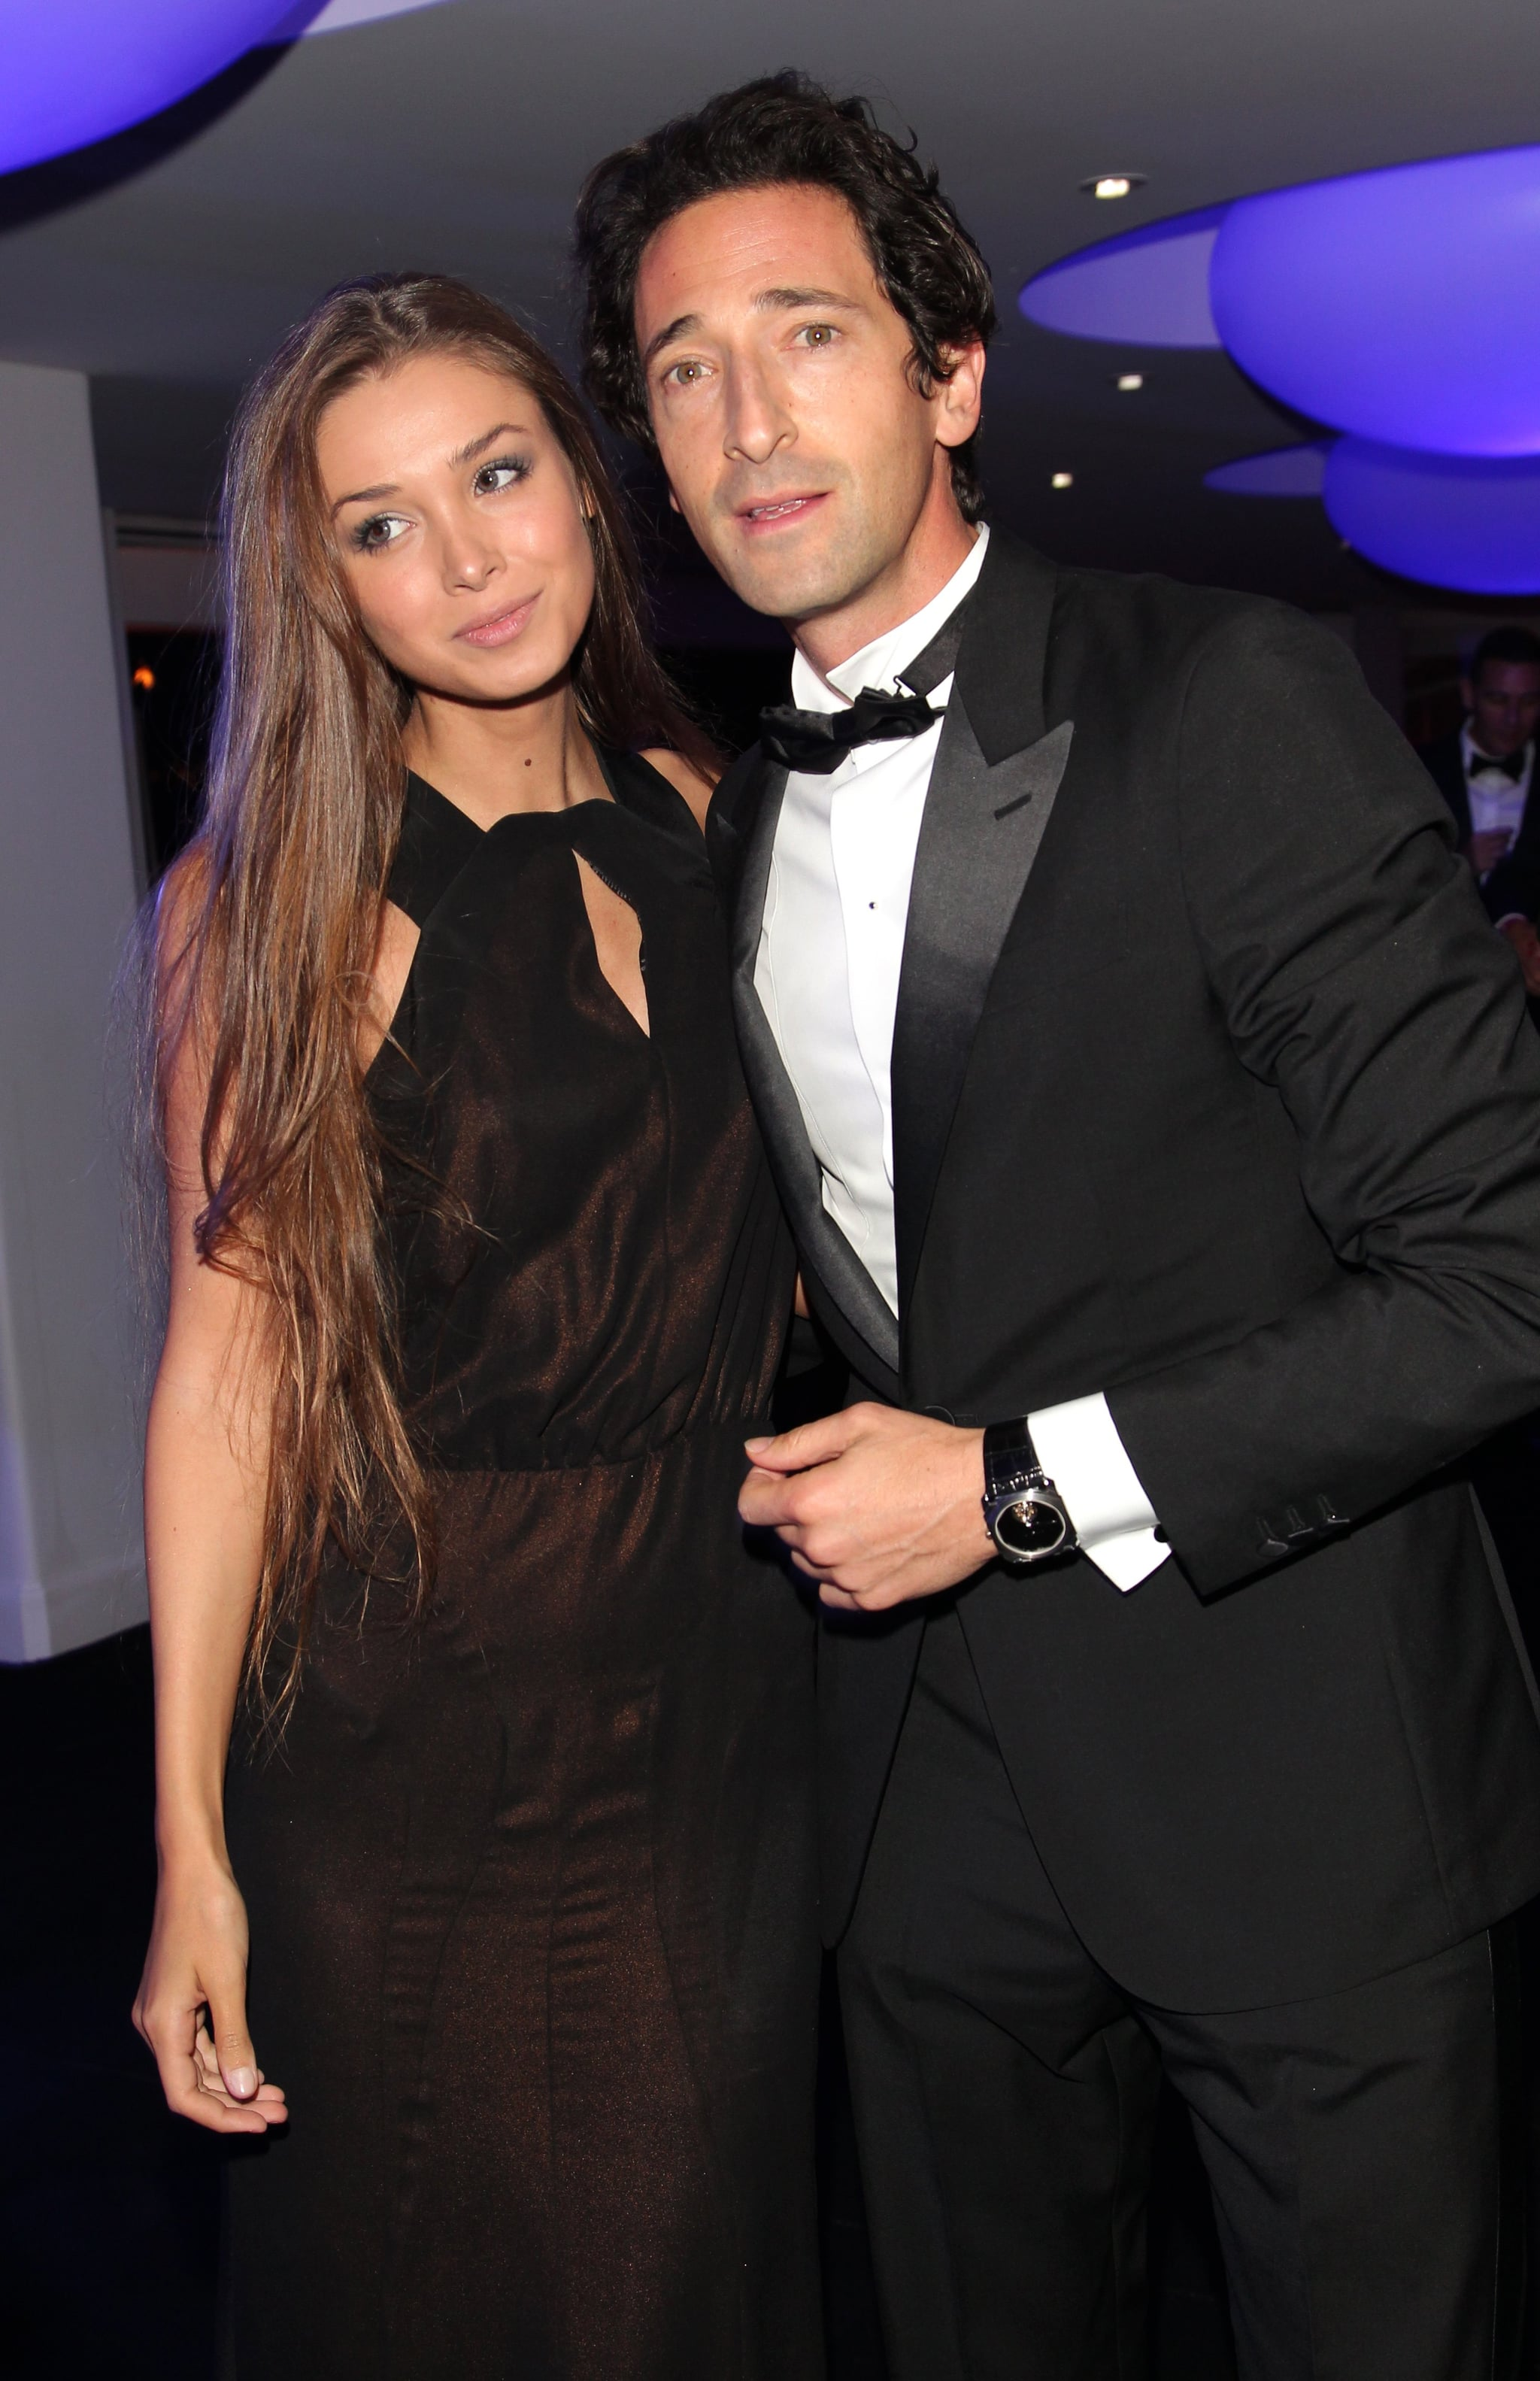 Adrien Brody and his girlfriend, Lara Lieto, posed.